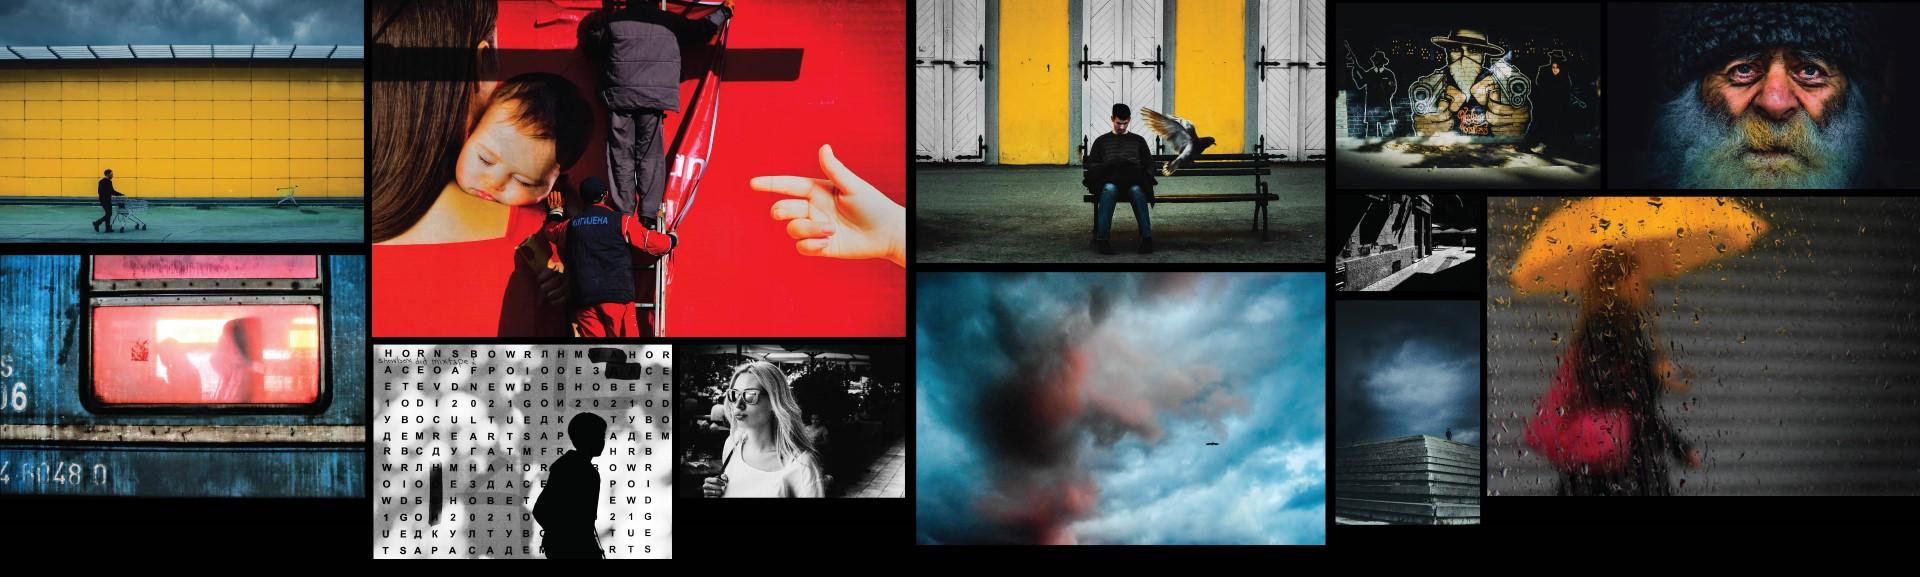 OSNOVNI KURS FOTOGRAFIJE - 10 x 2 casa / pet nedelja / 12000 RSD